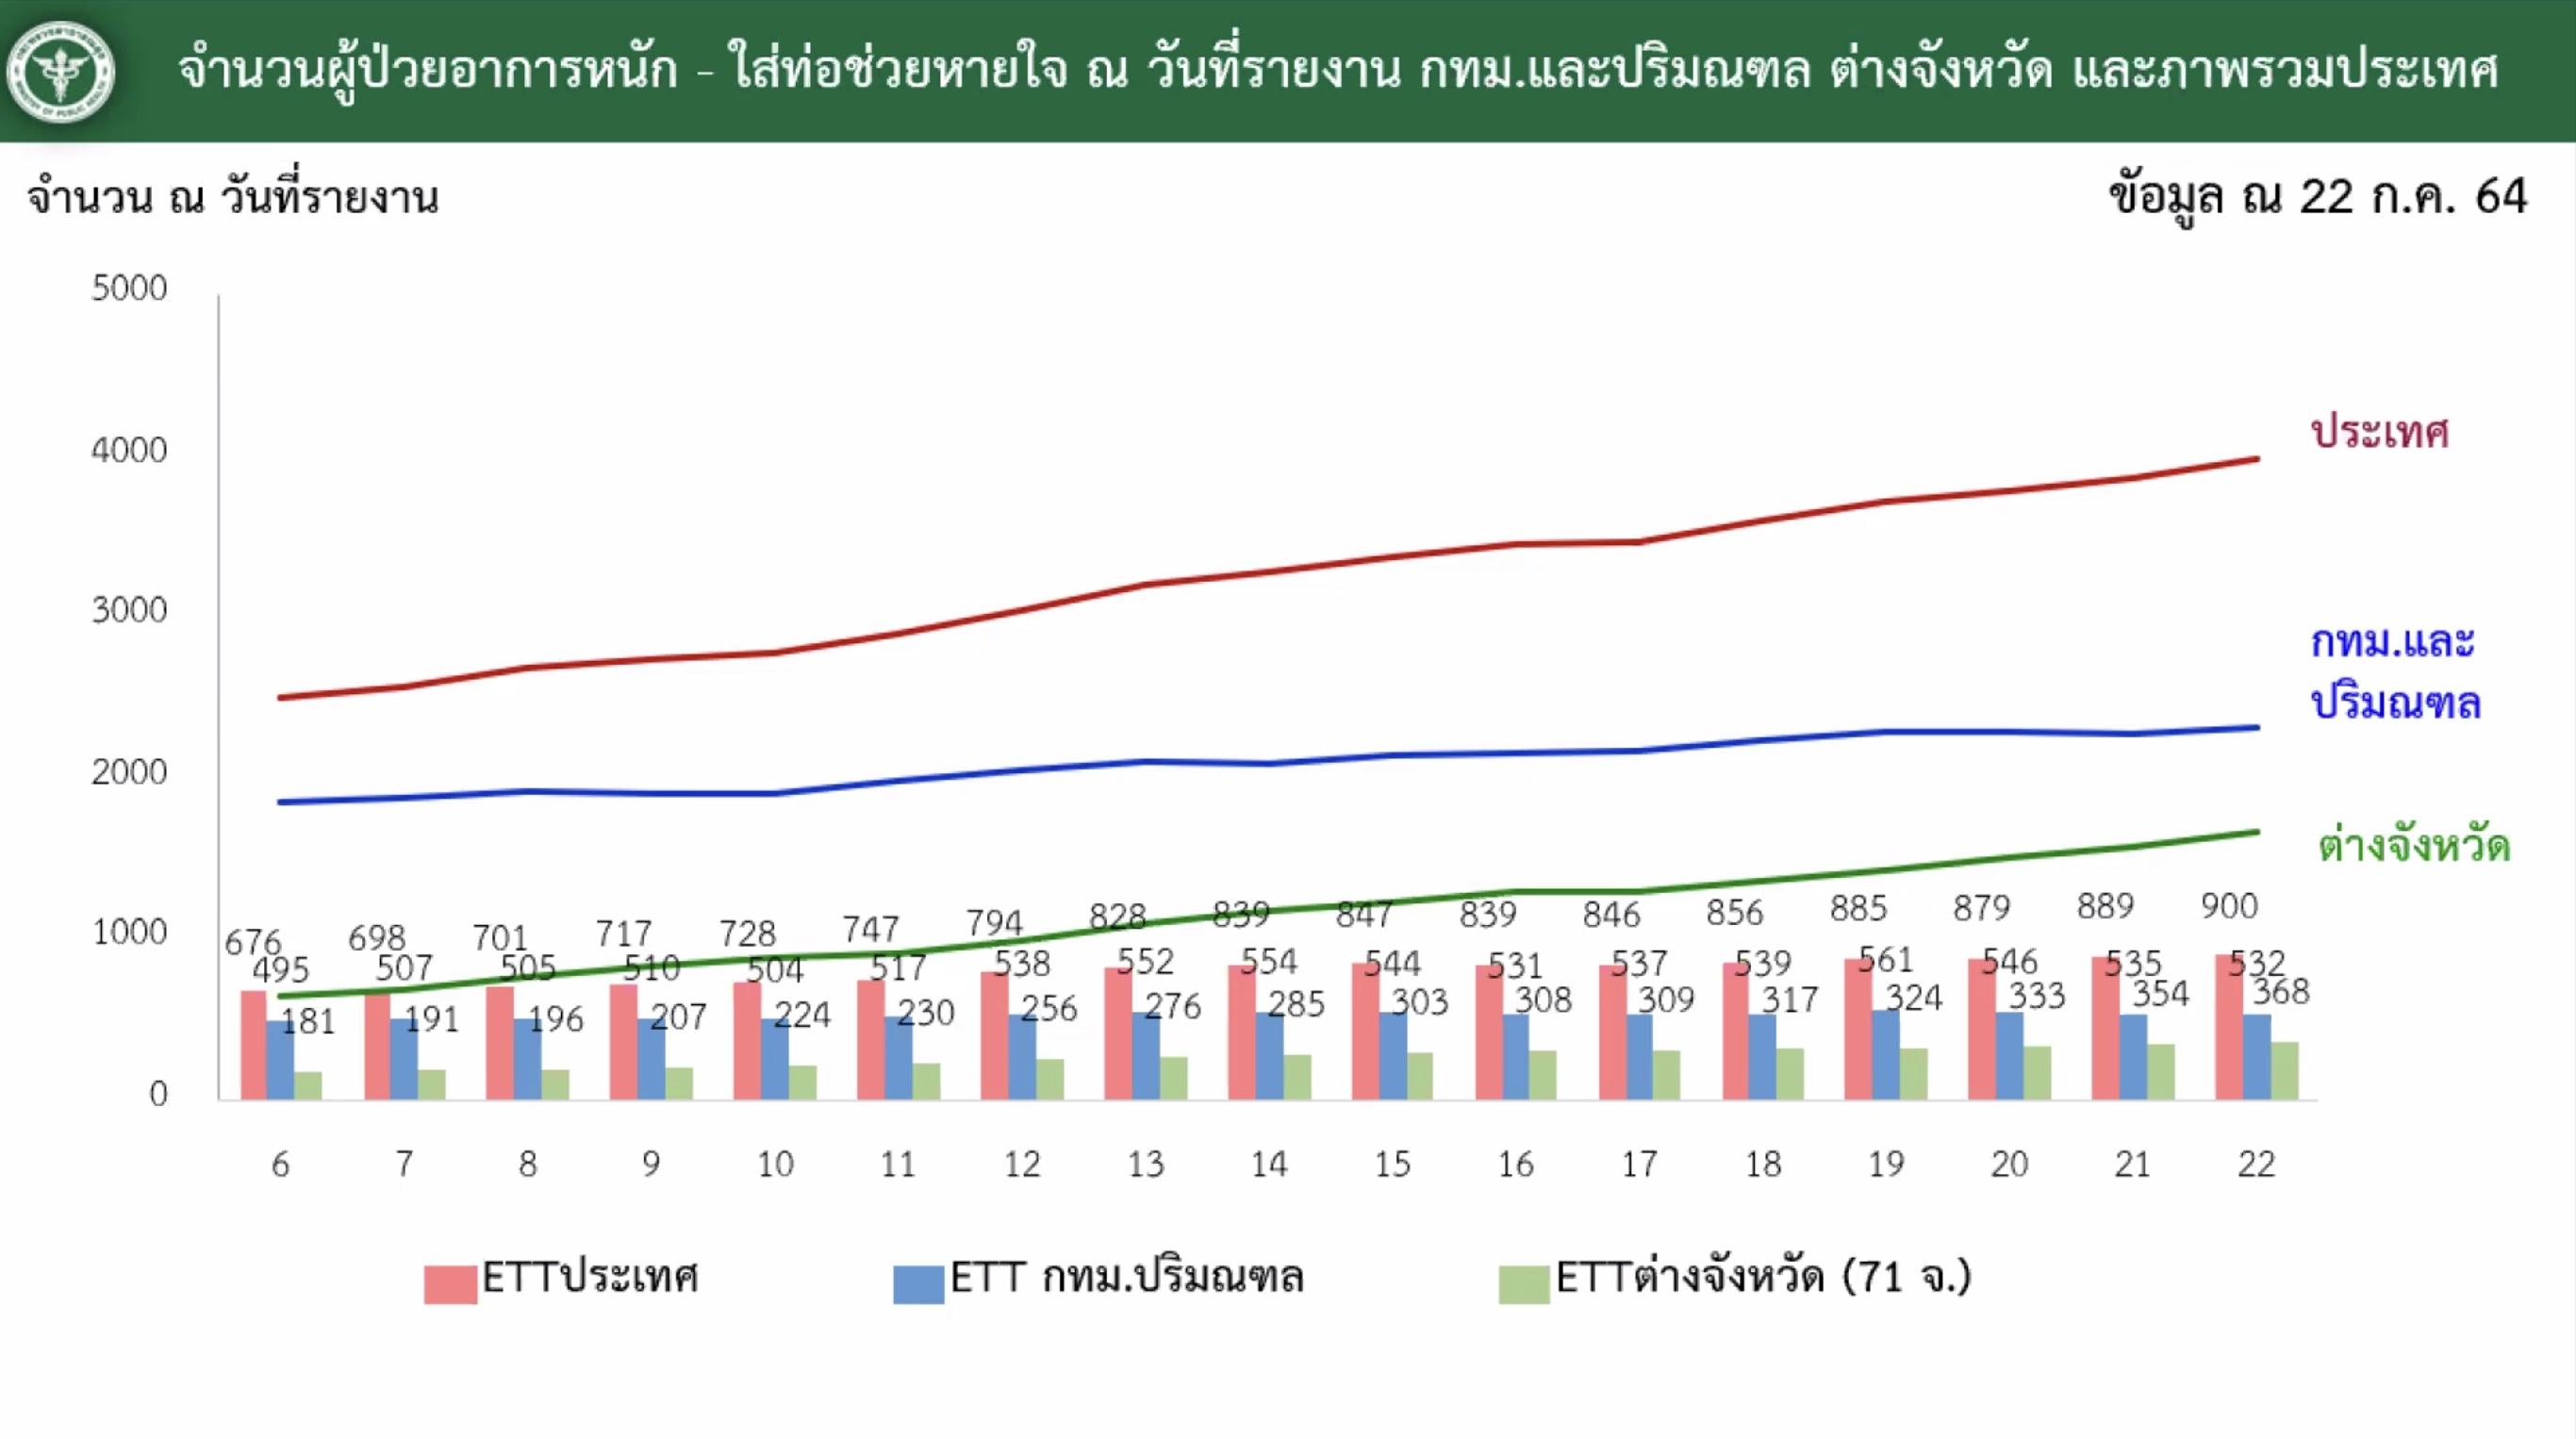 www.thaiguide.dk/images/forum/covid19/kritisk%20syge%20bangkok%20provinsen%2023-07-21.jpg